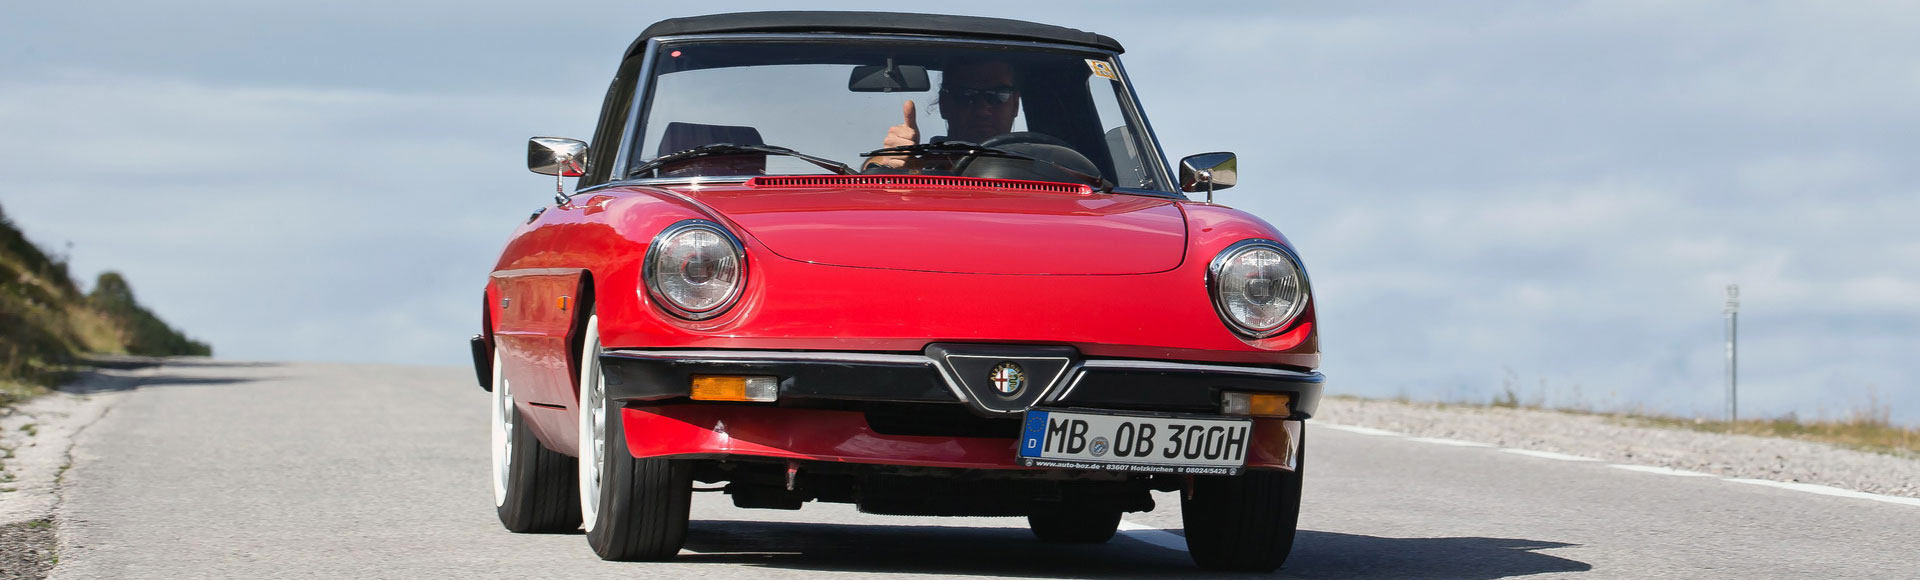 Alfa Romeo Spider 0441 Sommer